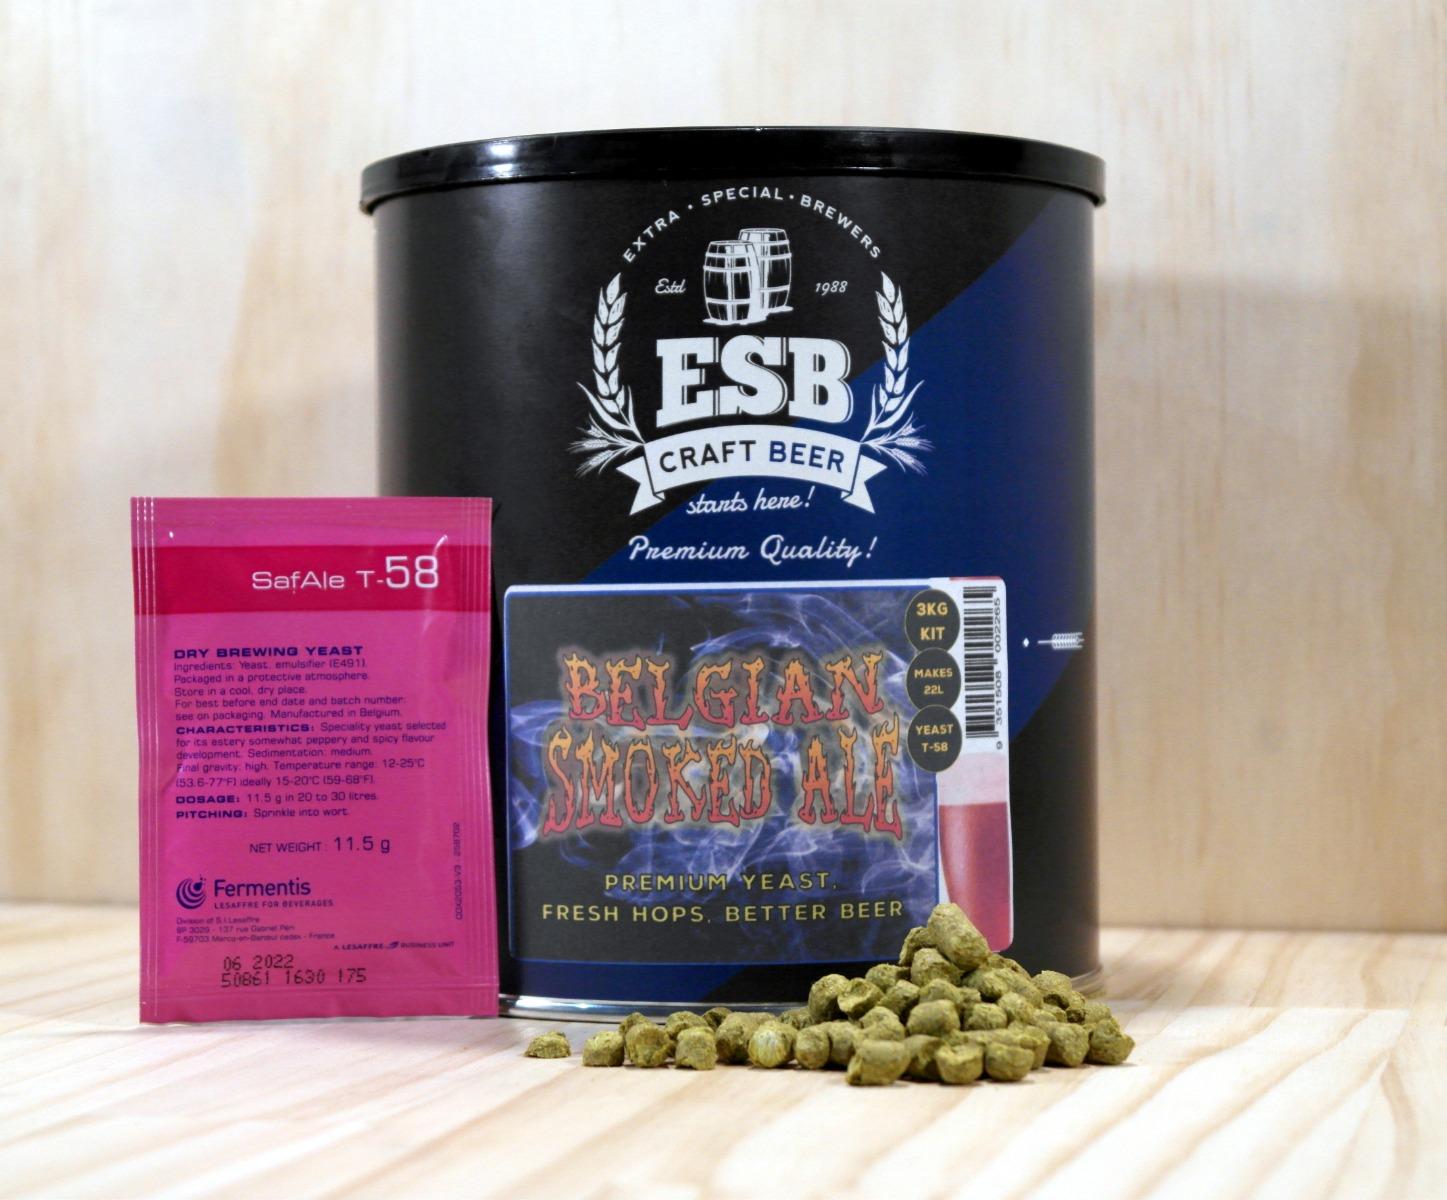 ESB 3kg Belgian Smoked Ale